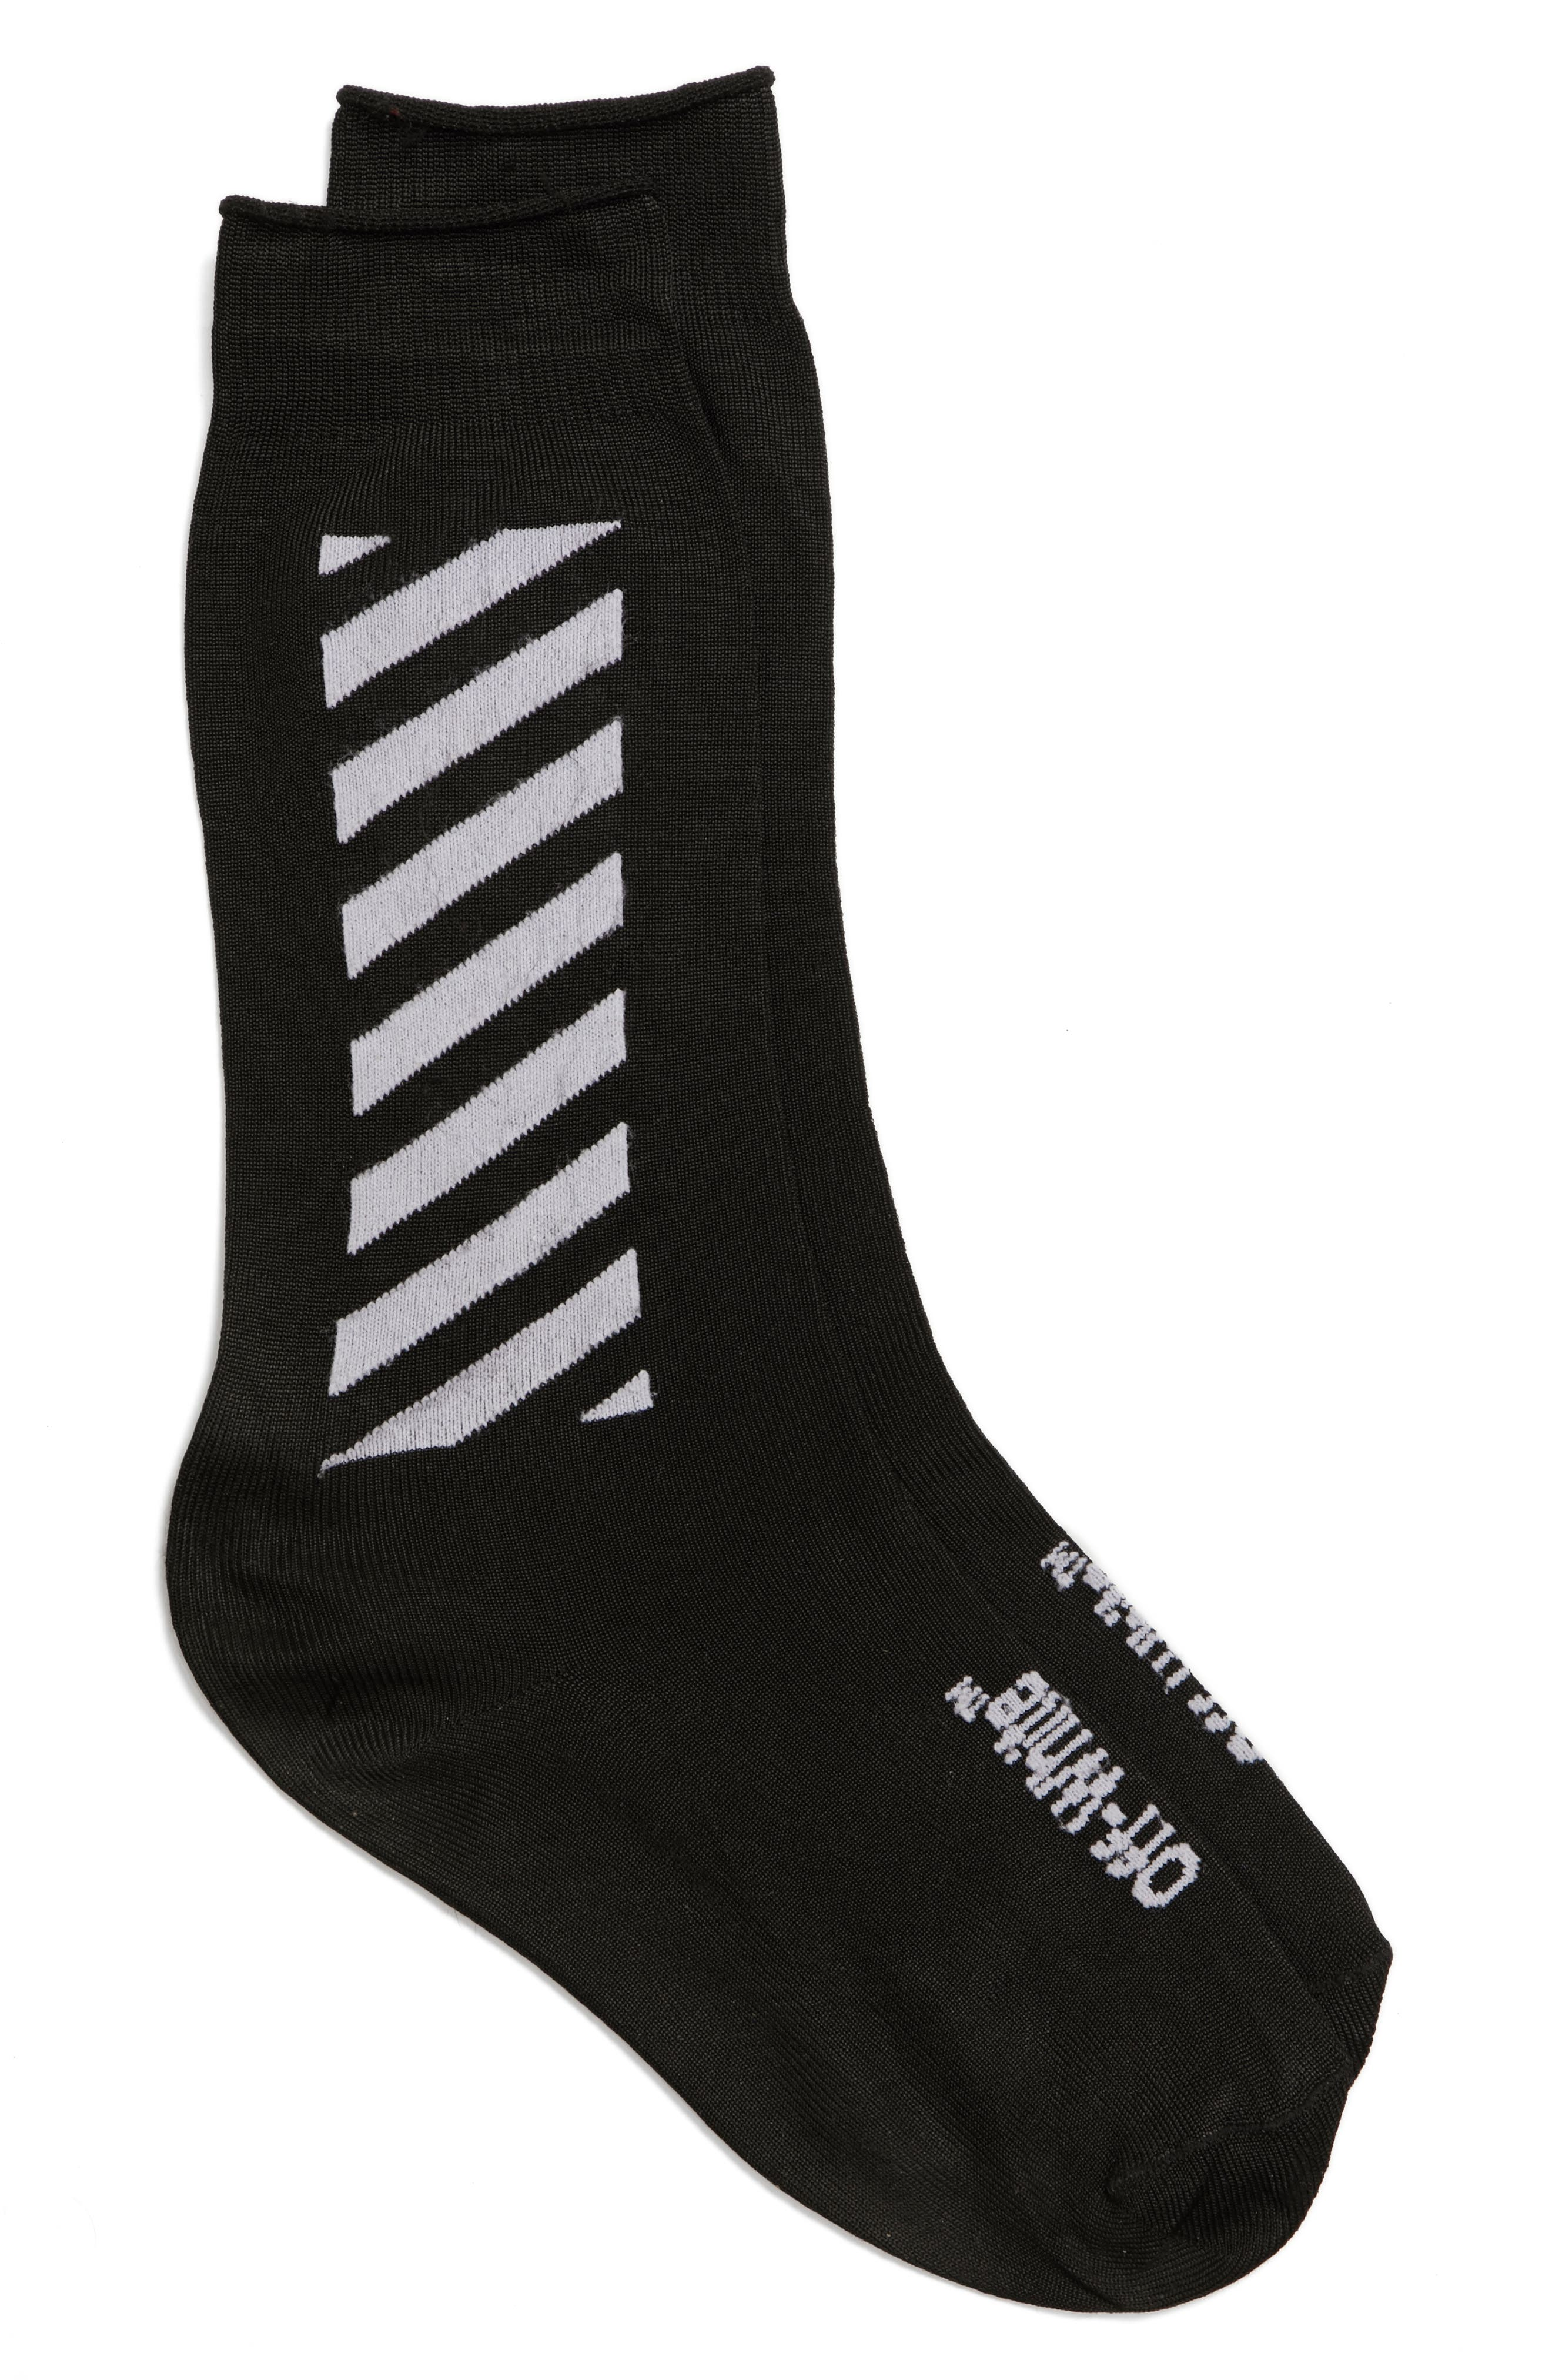 Diagonal Long Socks,                         Main,                         color, Black/ White